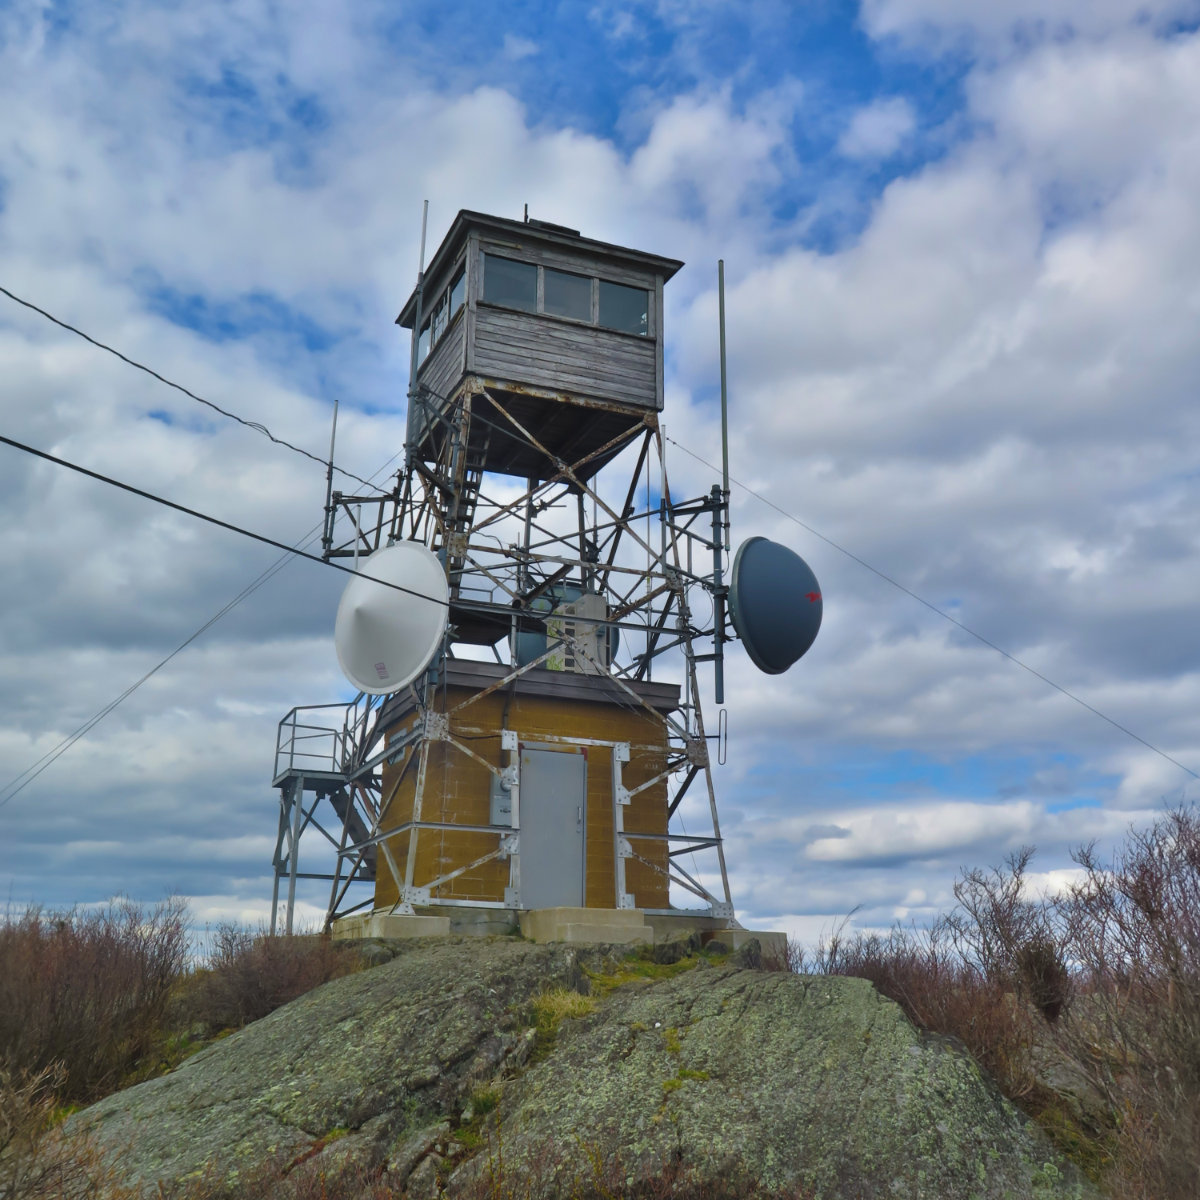 08-Pitcher-Fire-Tower-20200506